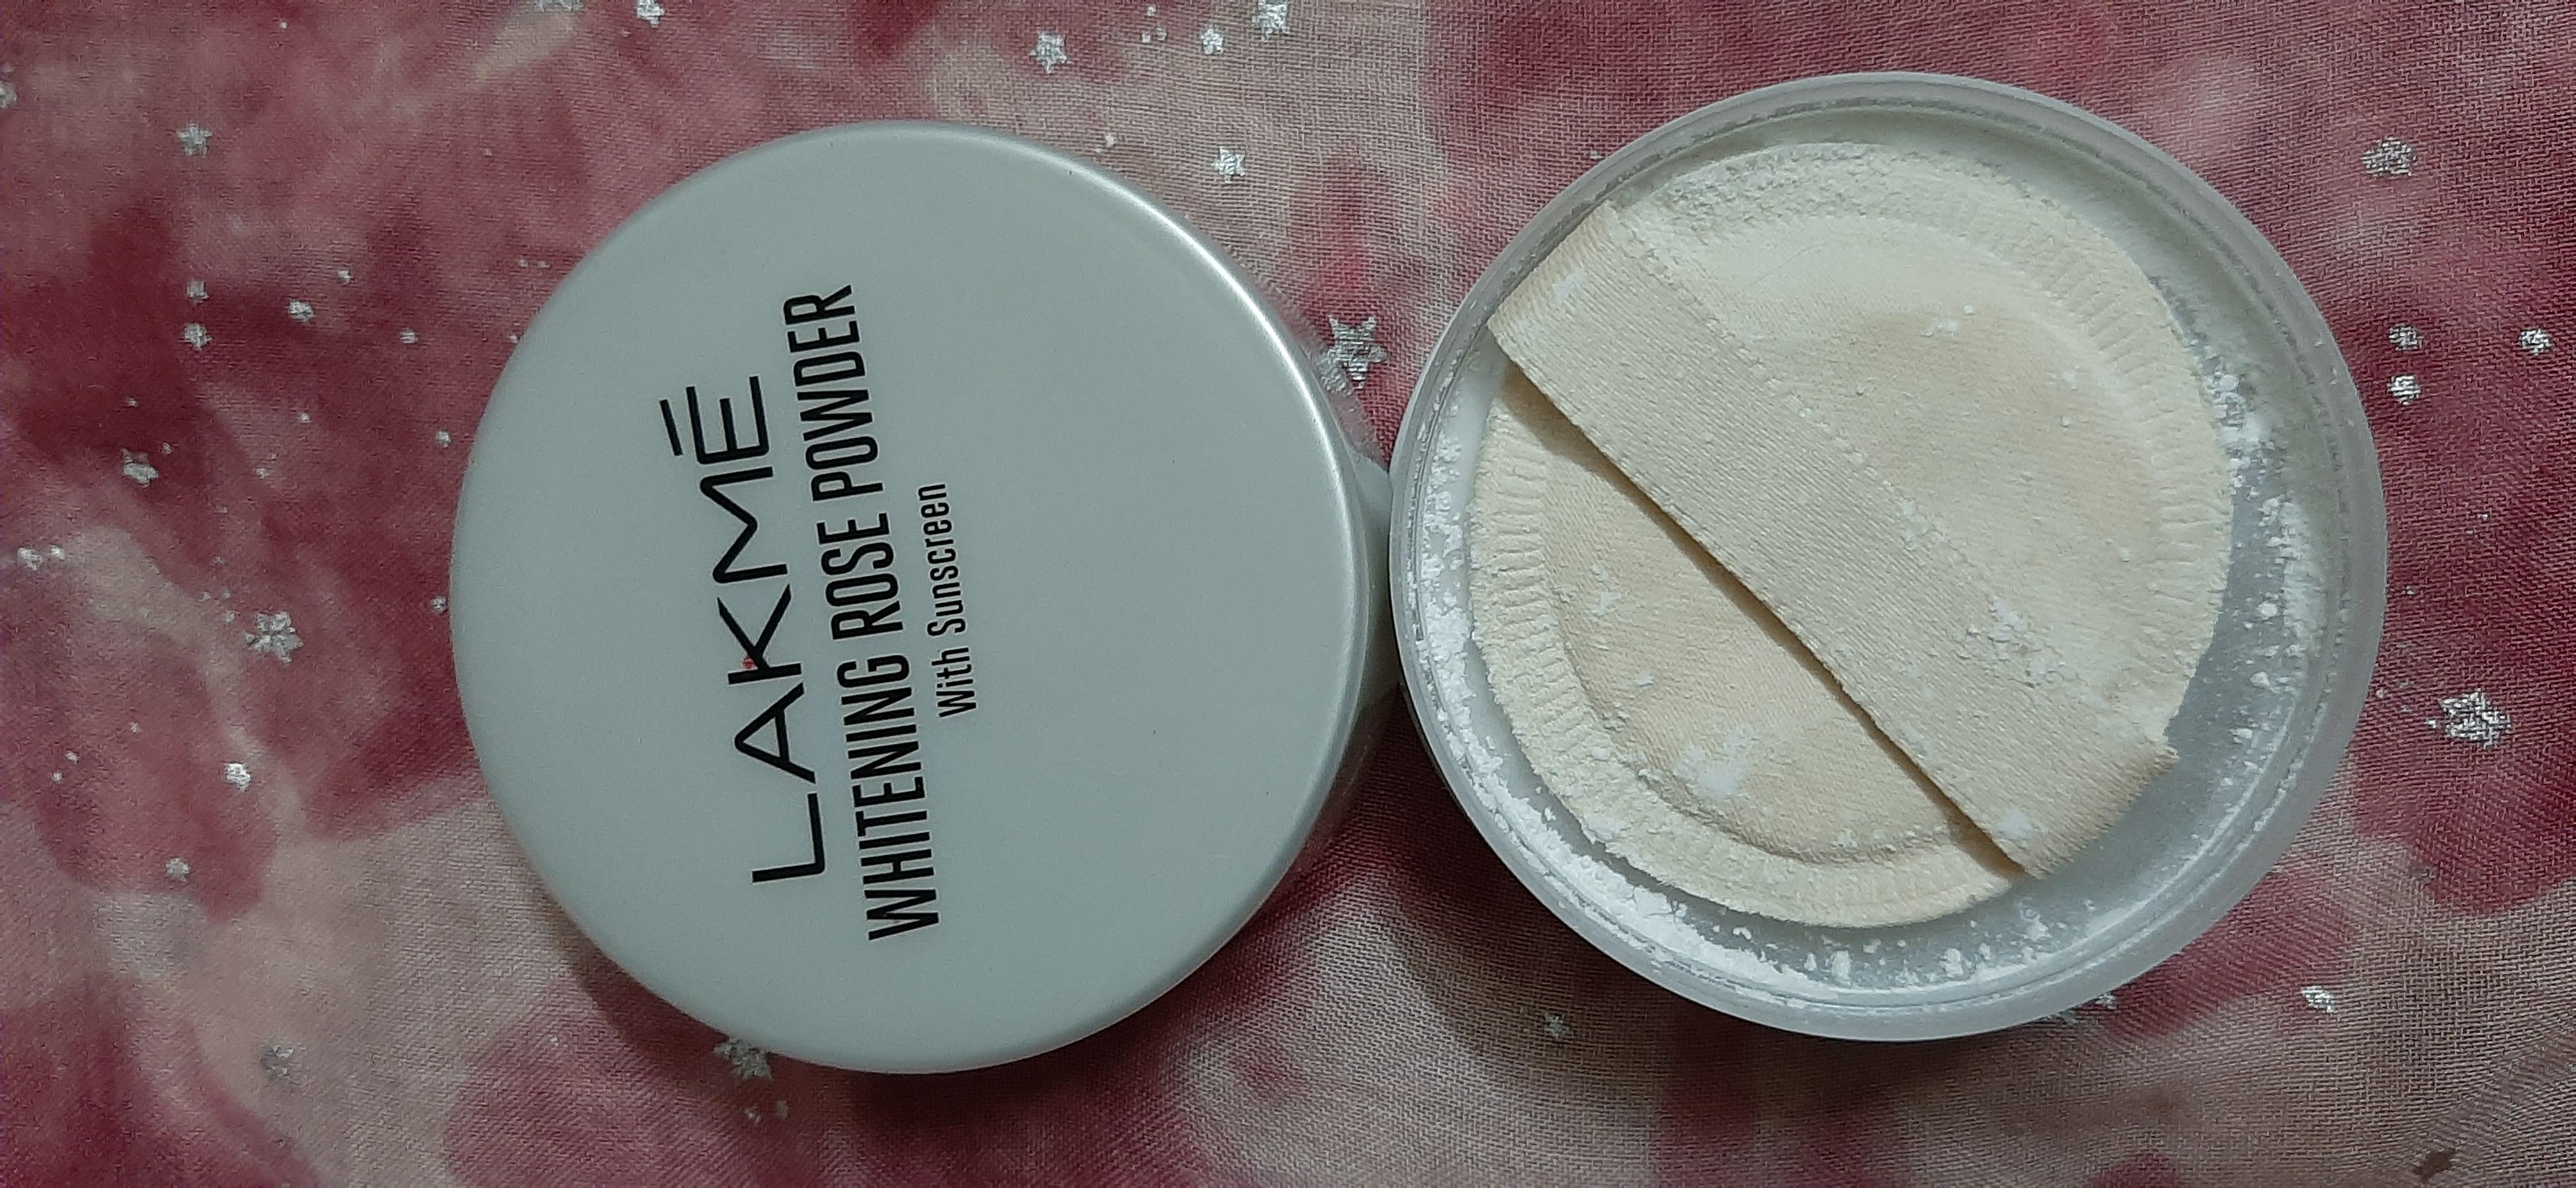 Lakme Whitening Rose Powder With Sunscreen pic 5-Best translucent powder-By samira_haider